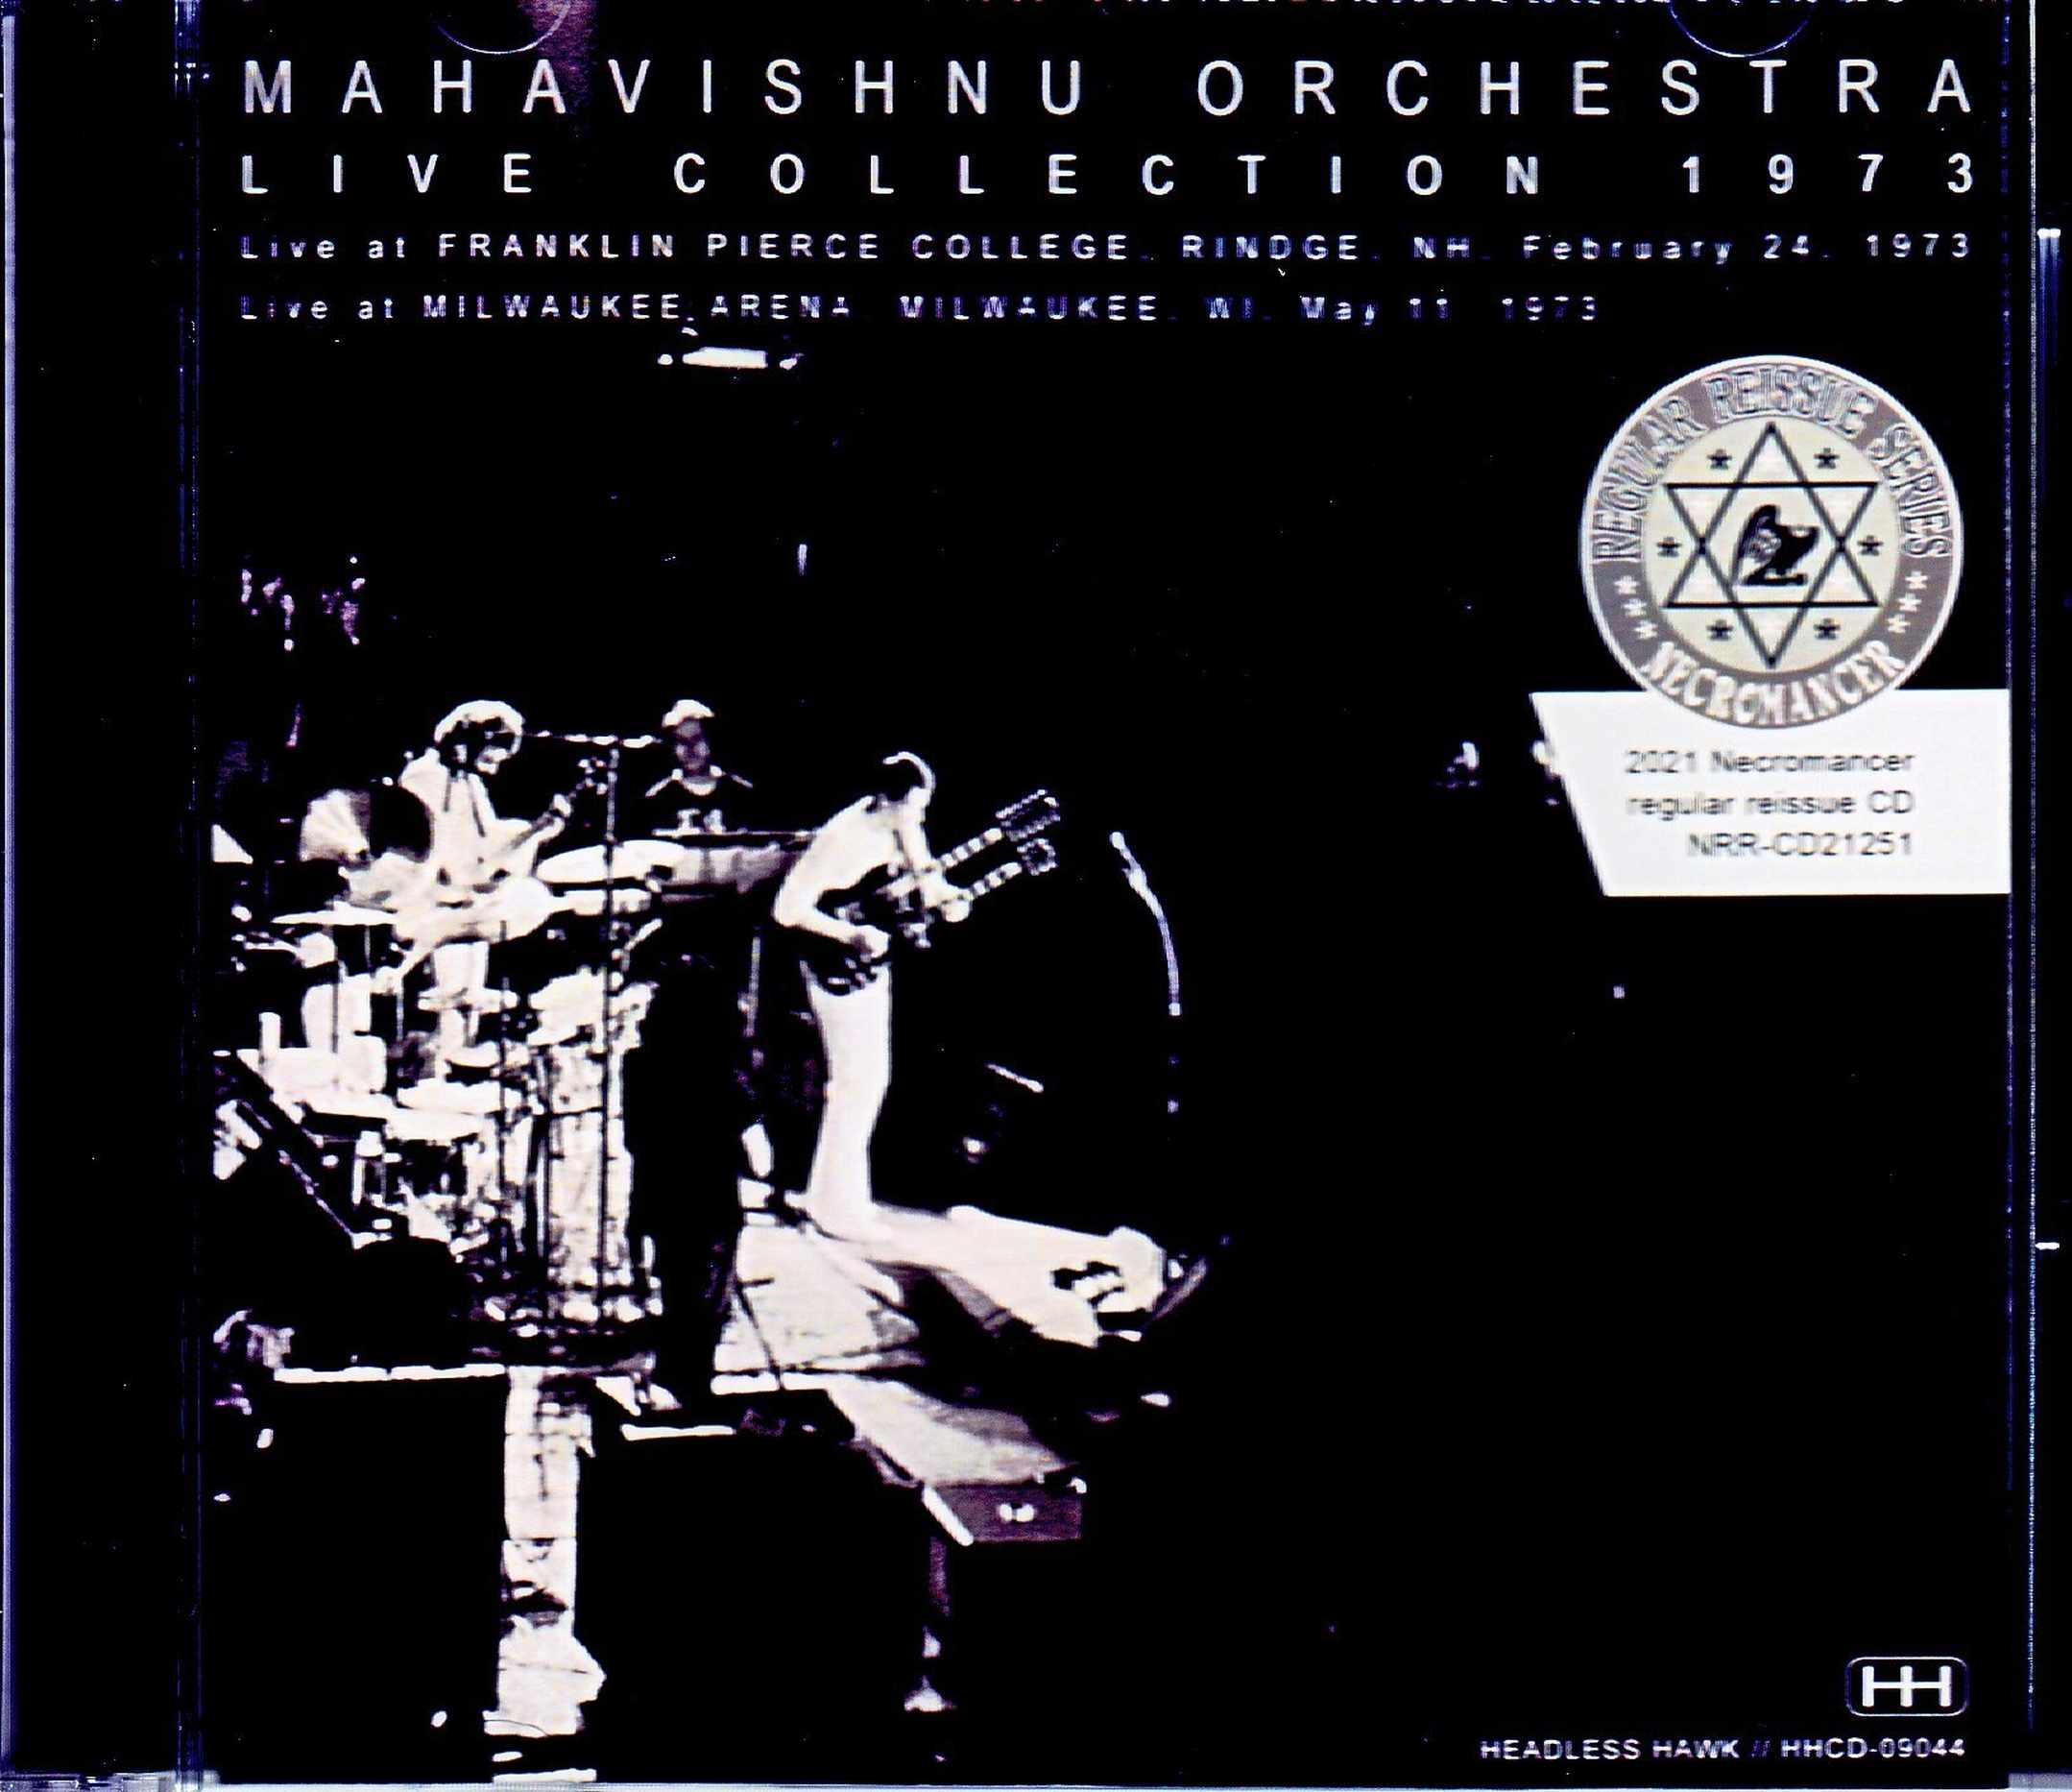 Mahavishnu Orchestra マハヴィシュヌ・オーケストラ/NH,USA 1973 & more